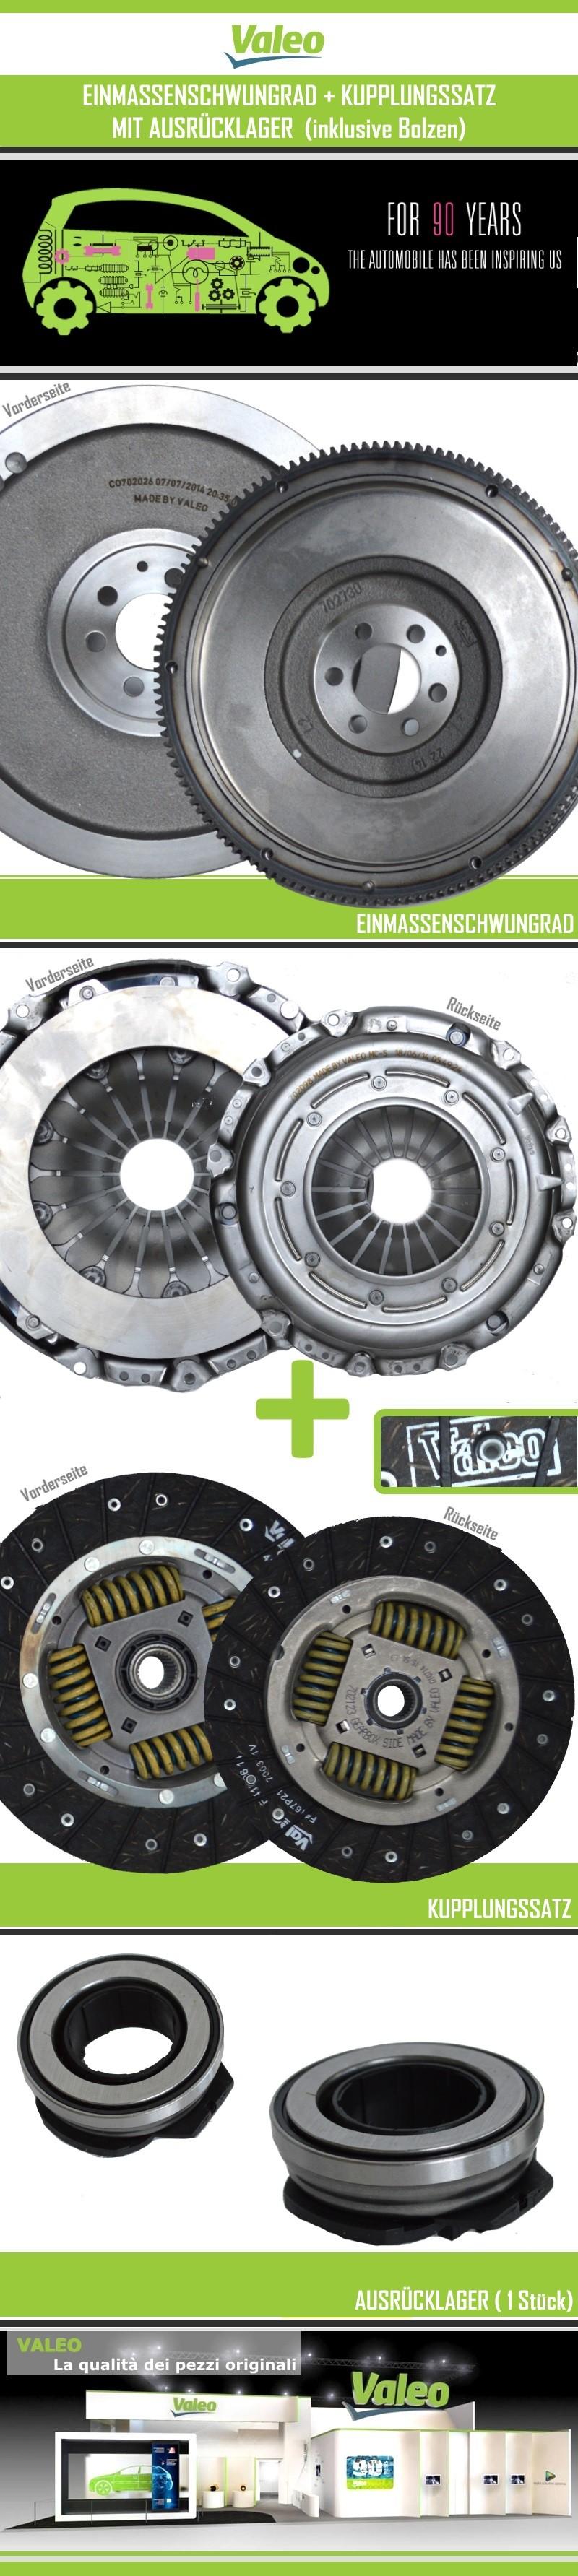 Kupplungssatz valeo 4 komponenten kit 3 komponenten kit for Smc ricambi auto